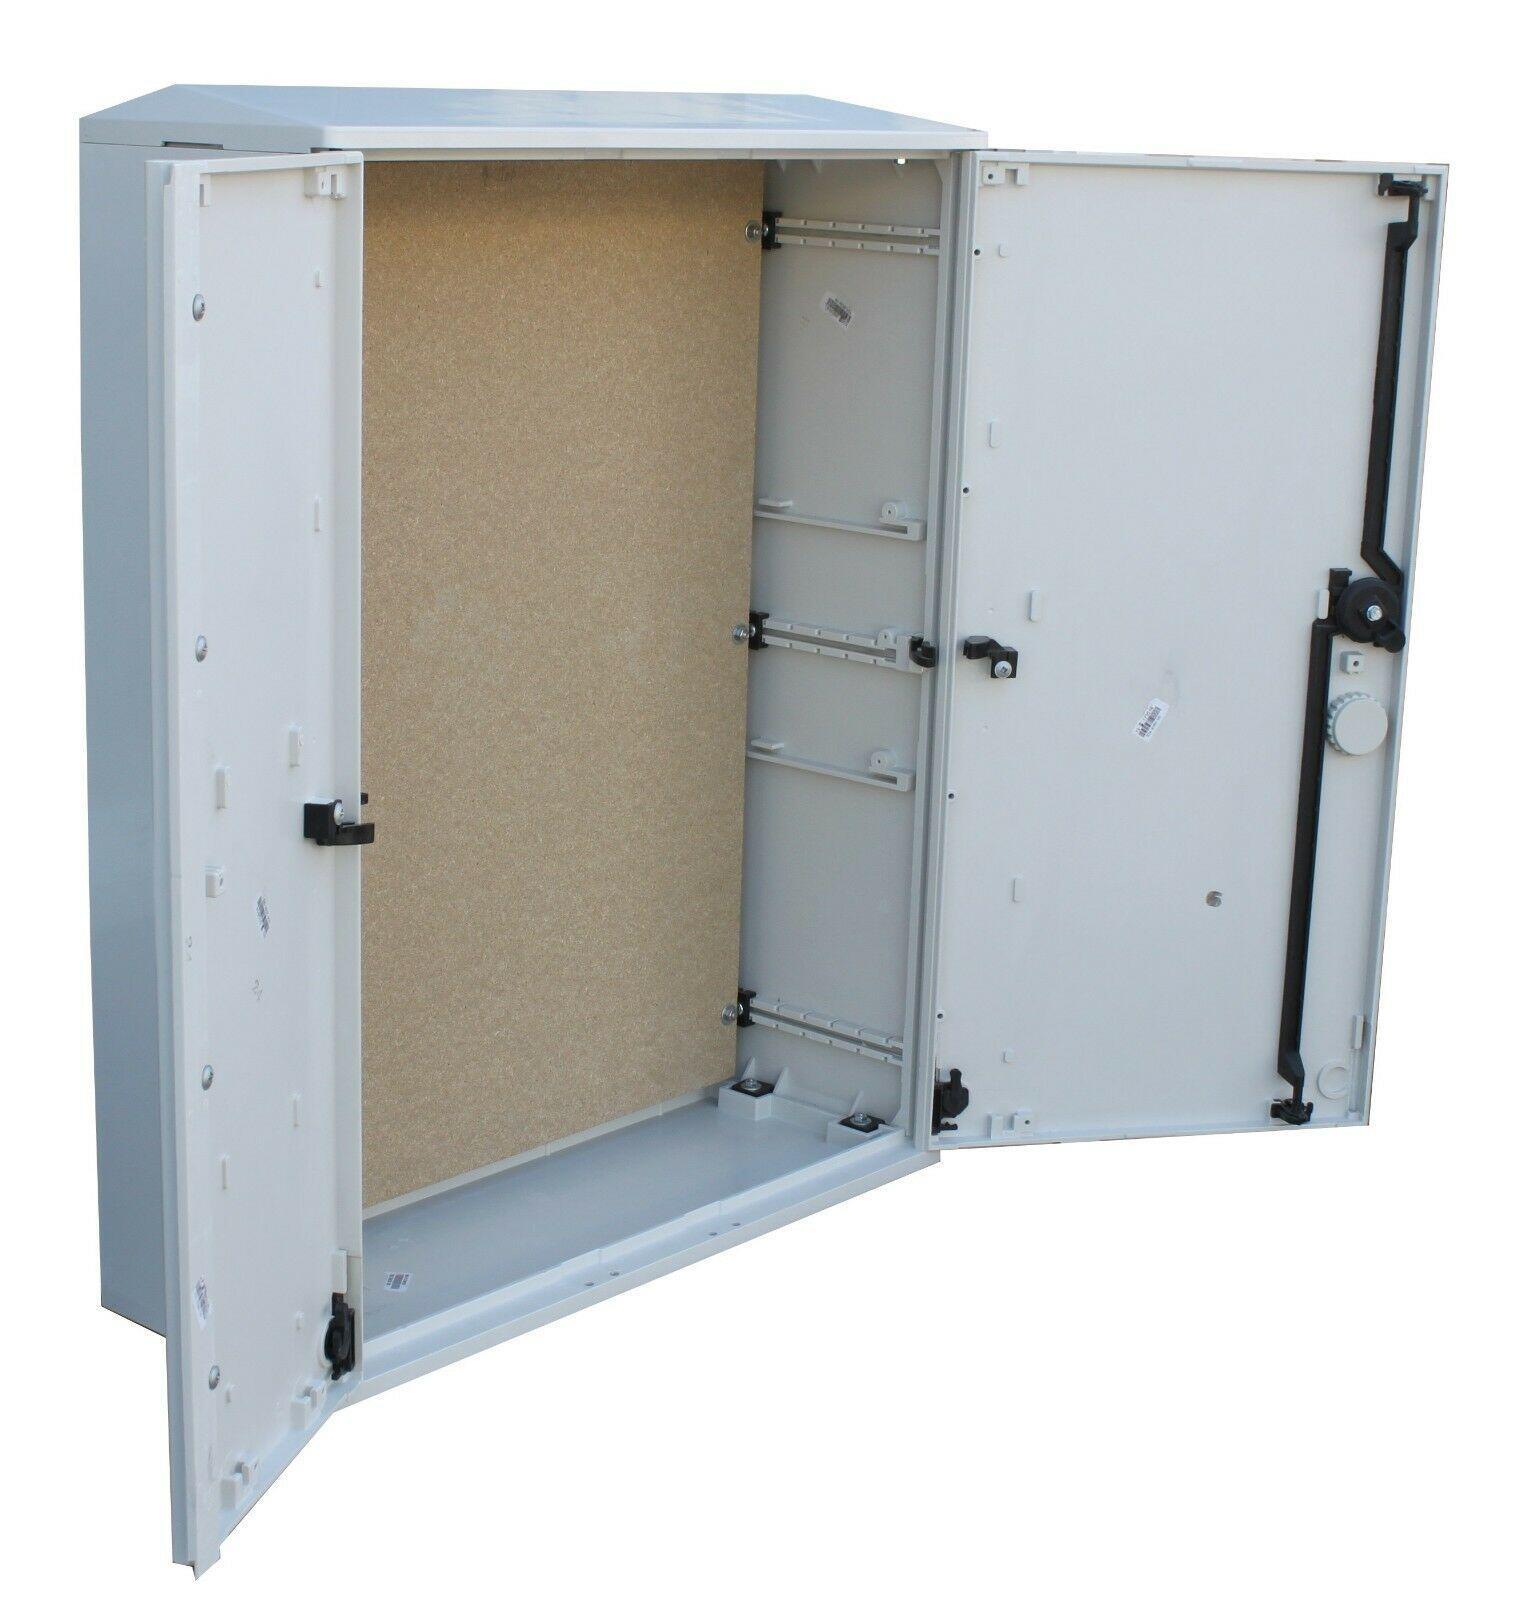 GRP Electric Enclosure, Kiosk, Cabinet, Meter Box, Housing (W660 x H800 x D245mm) Inside Open Doors